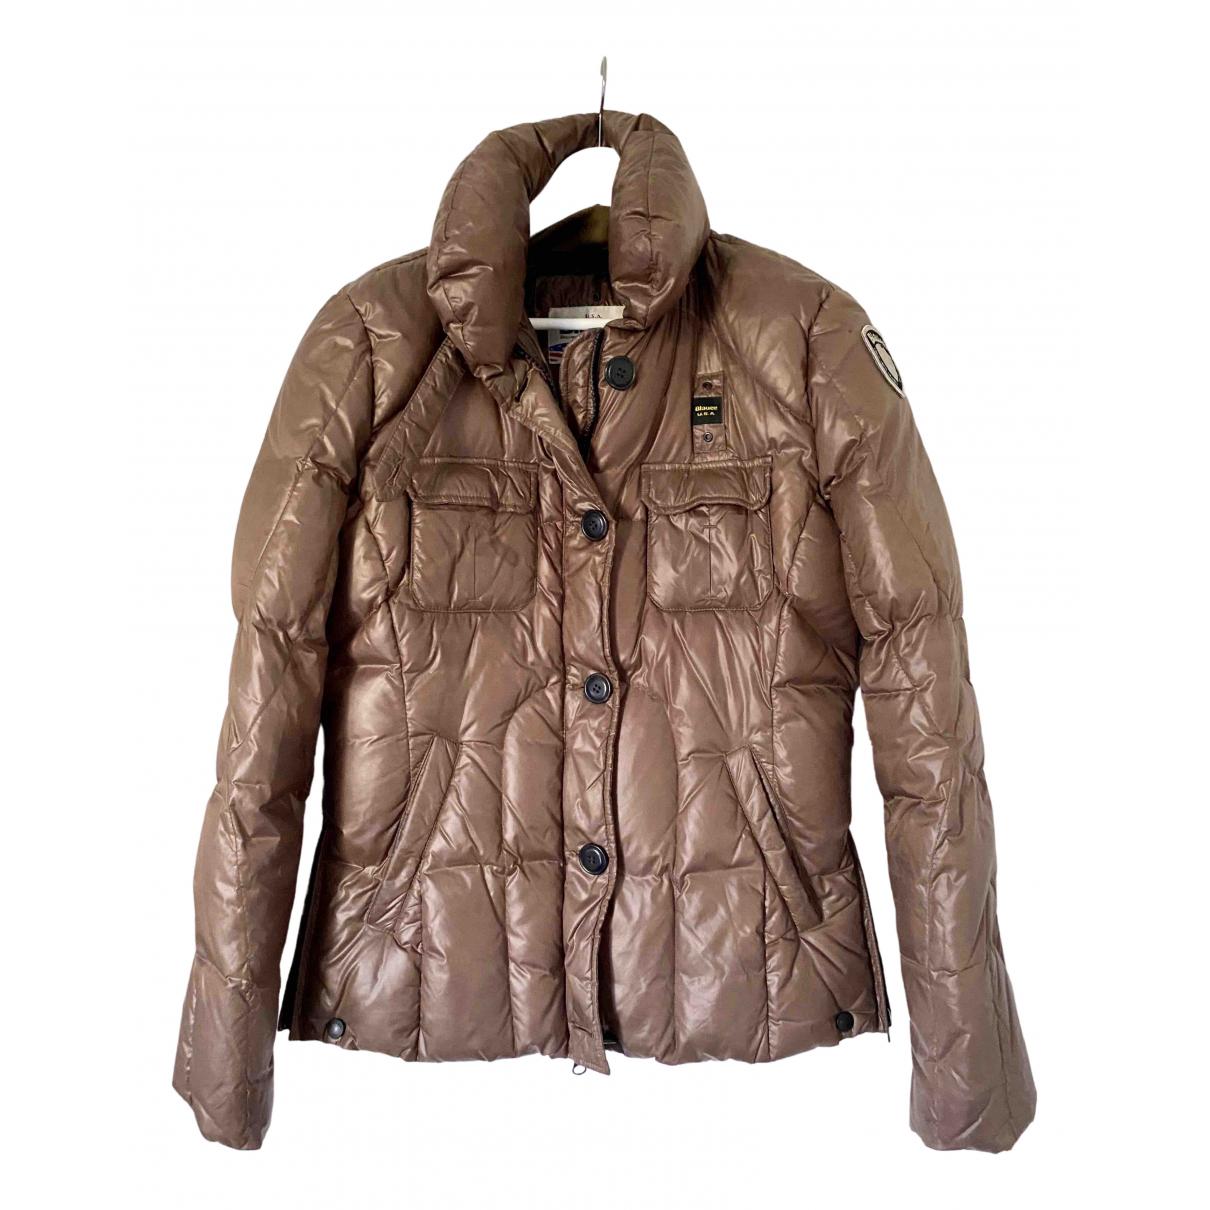 Blauer \N Brown jacket for Women XL International